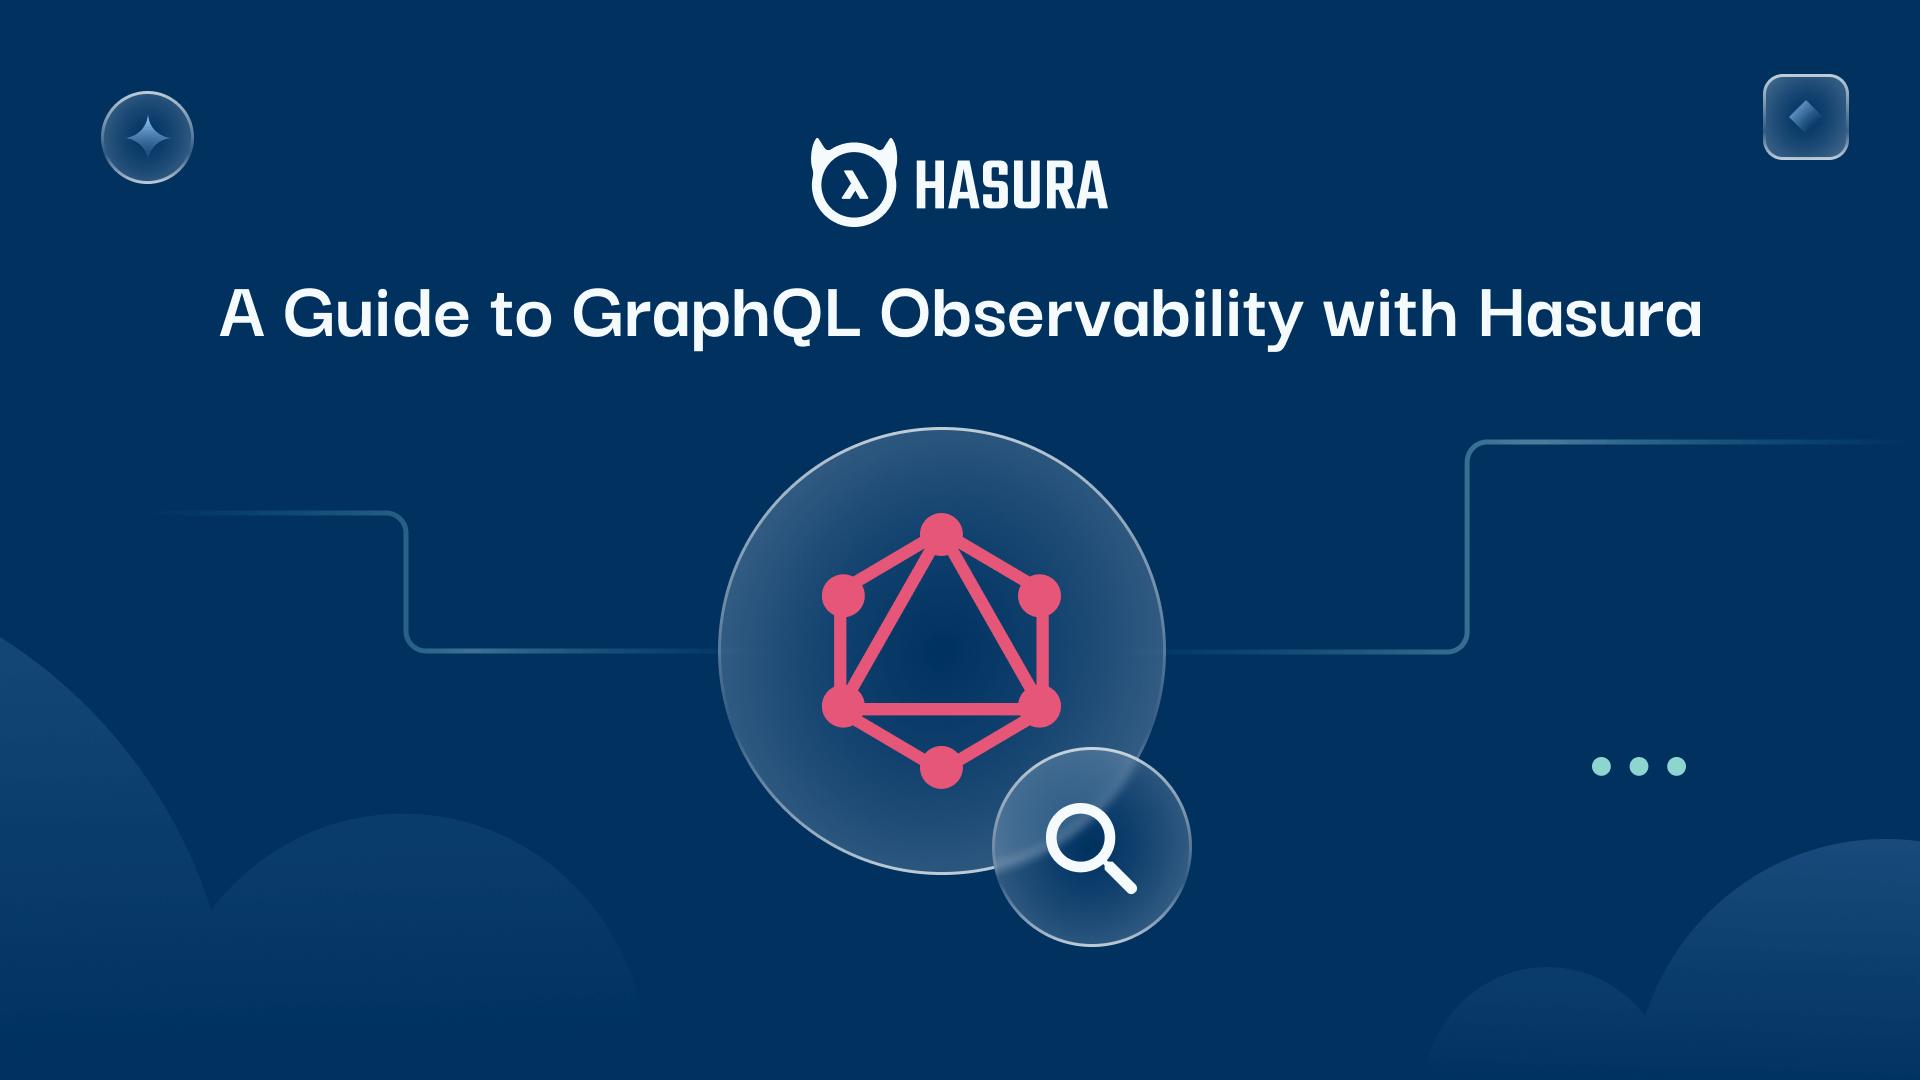 GraphQL Observability with Hasura